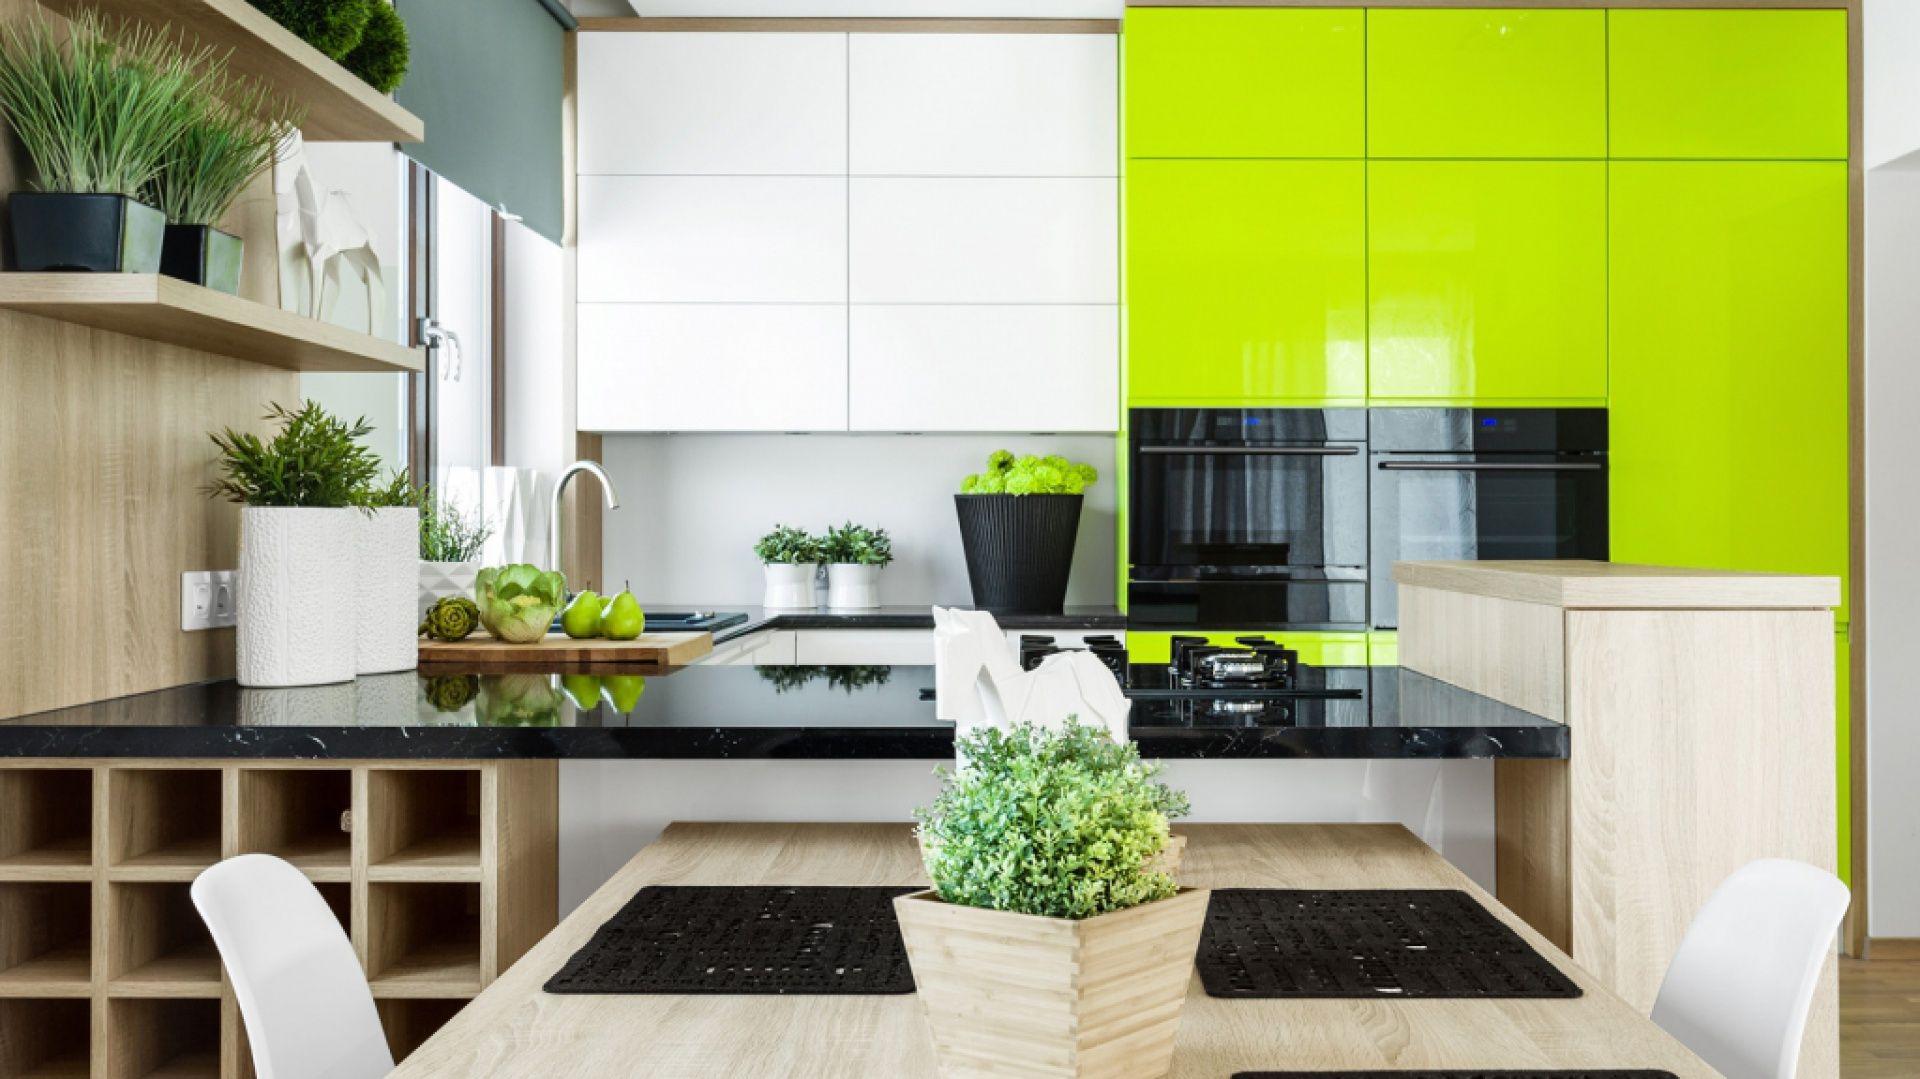 Aranzacje Wnetrz Kuchnia Projekt Wnetrz Katowice Beforeconcept Przegladaj Dod Kitchen Remodel Small Kitchen Interior Design Modern Black Kitchen Decor